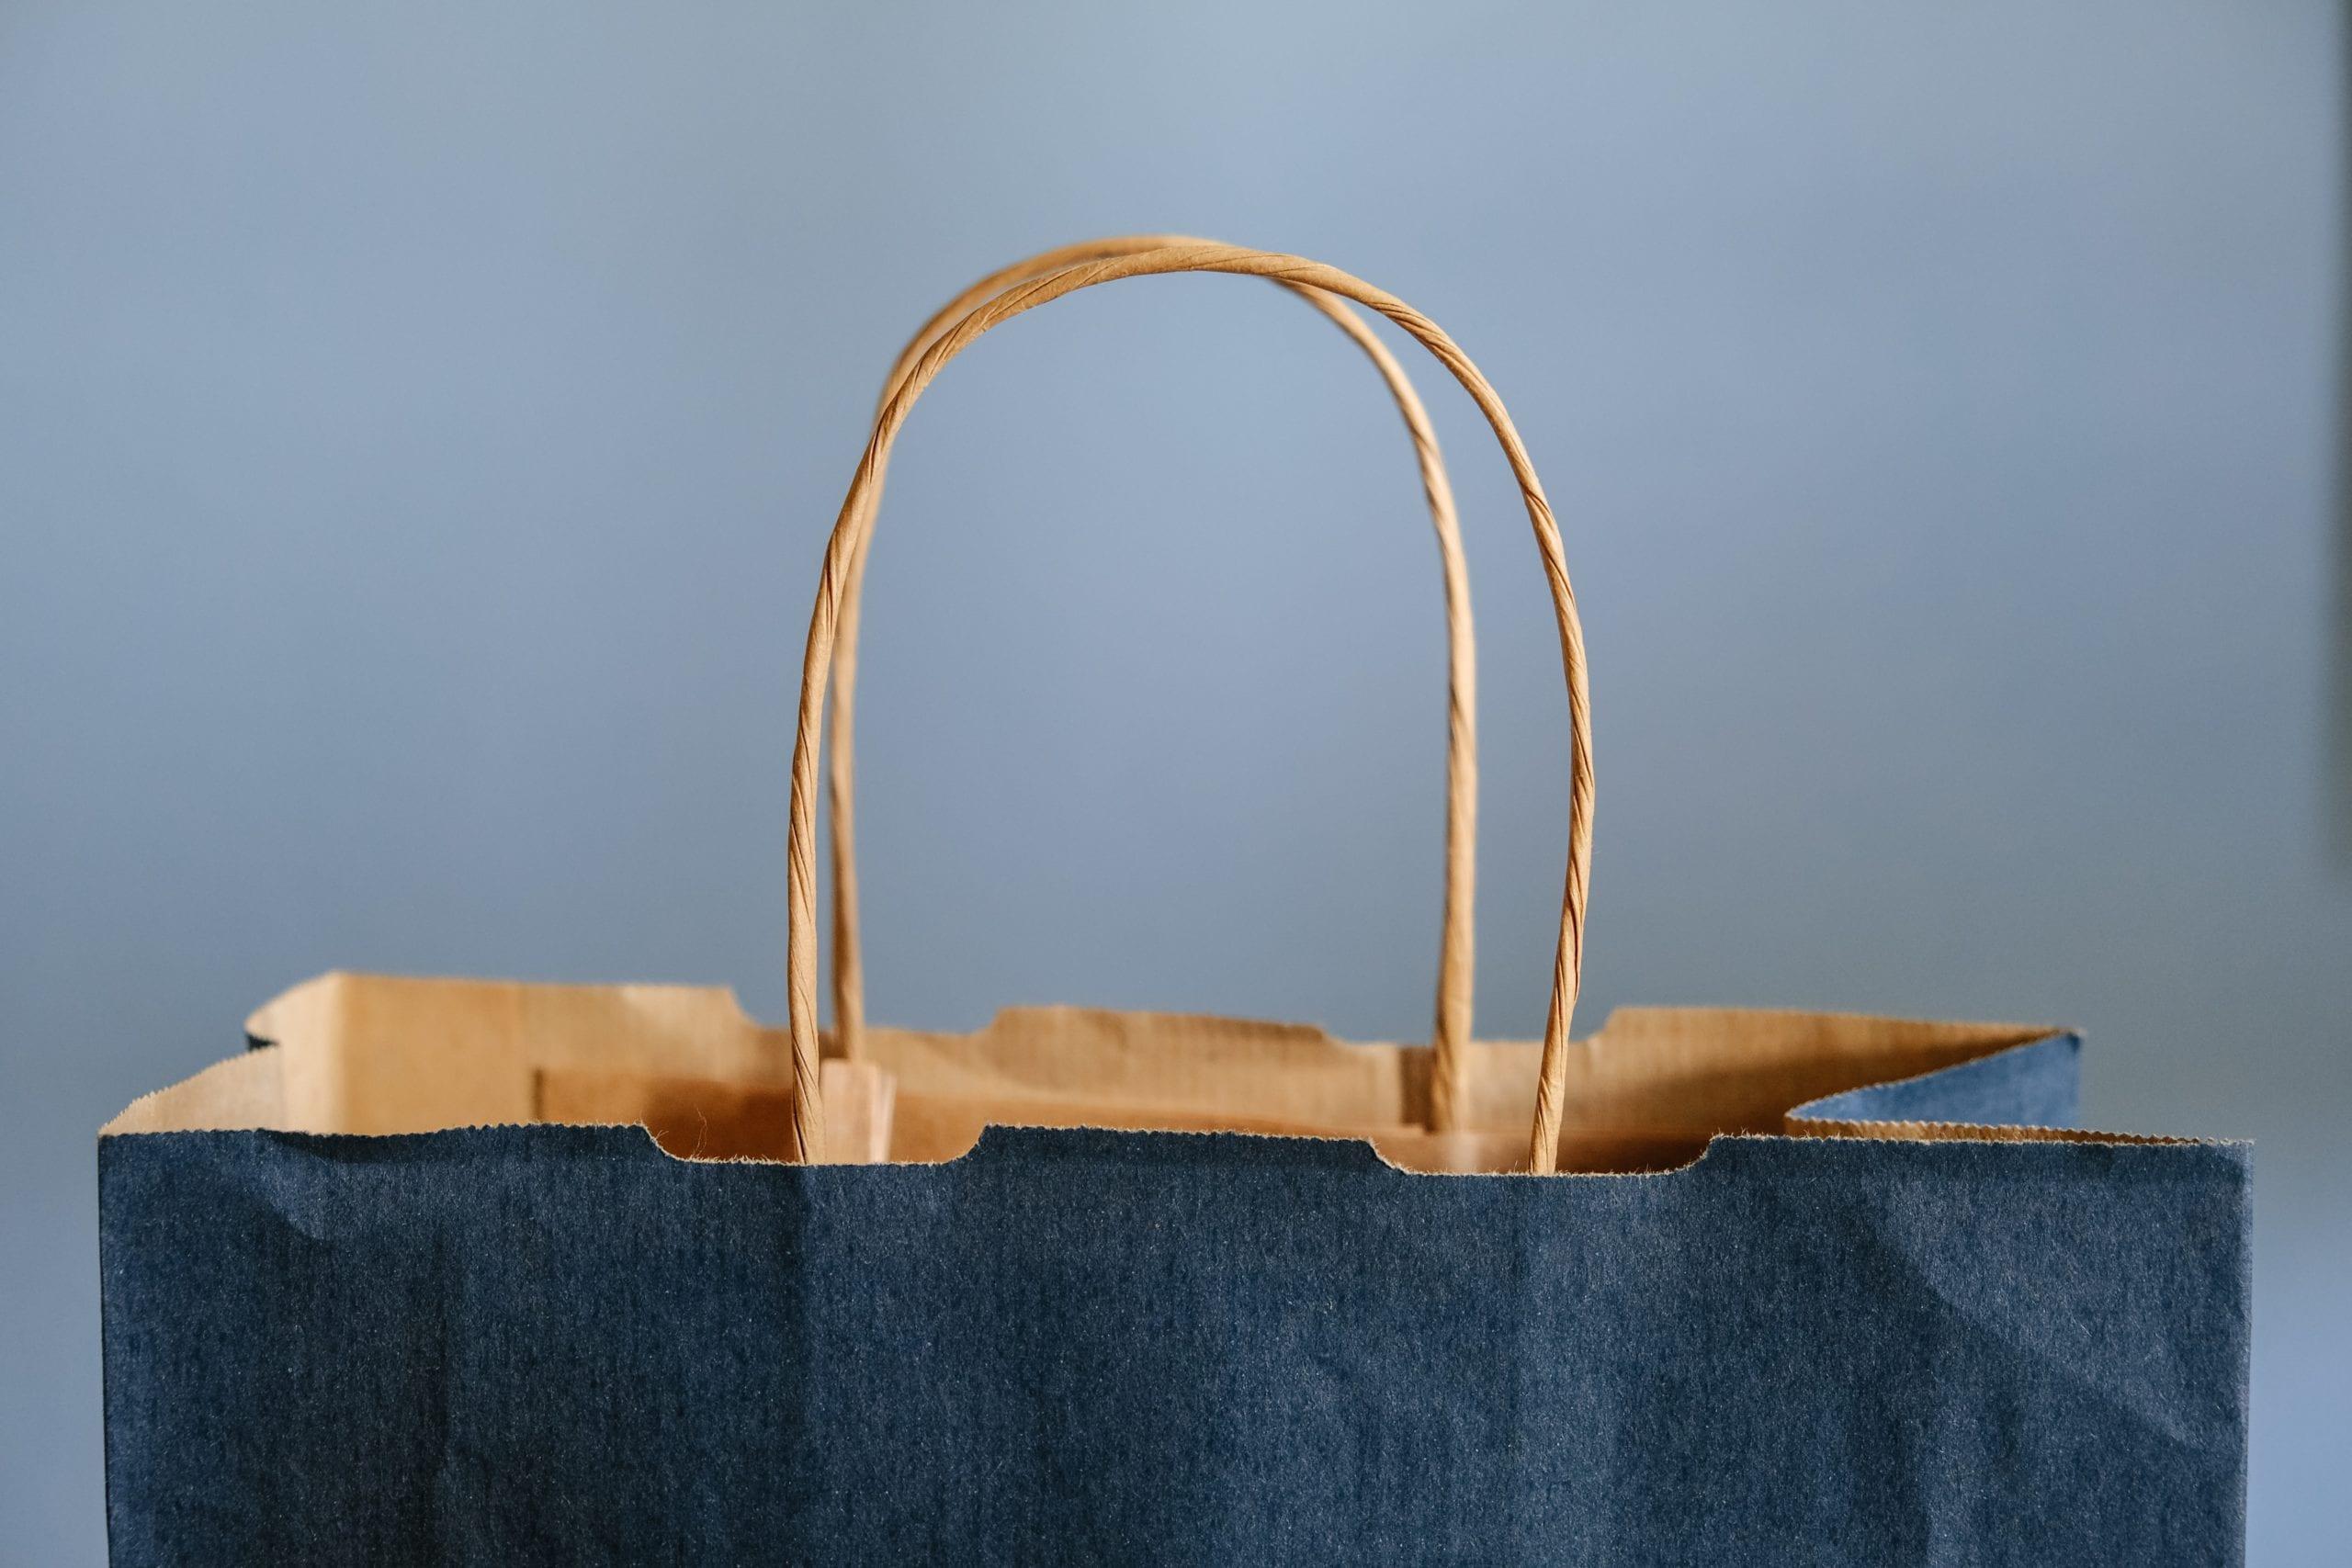 Close up shot of brown paper shopping bag